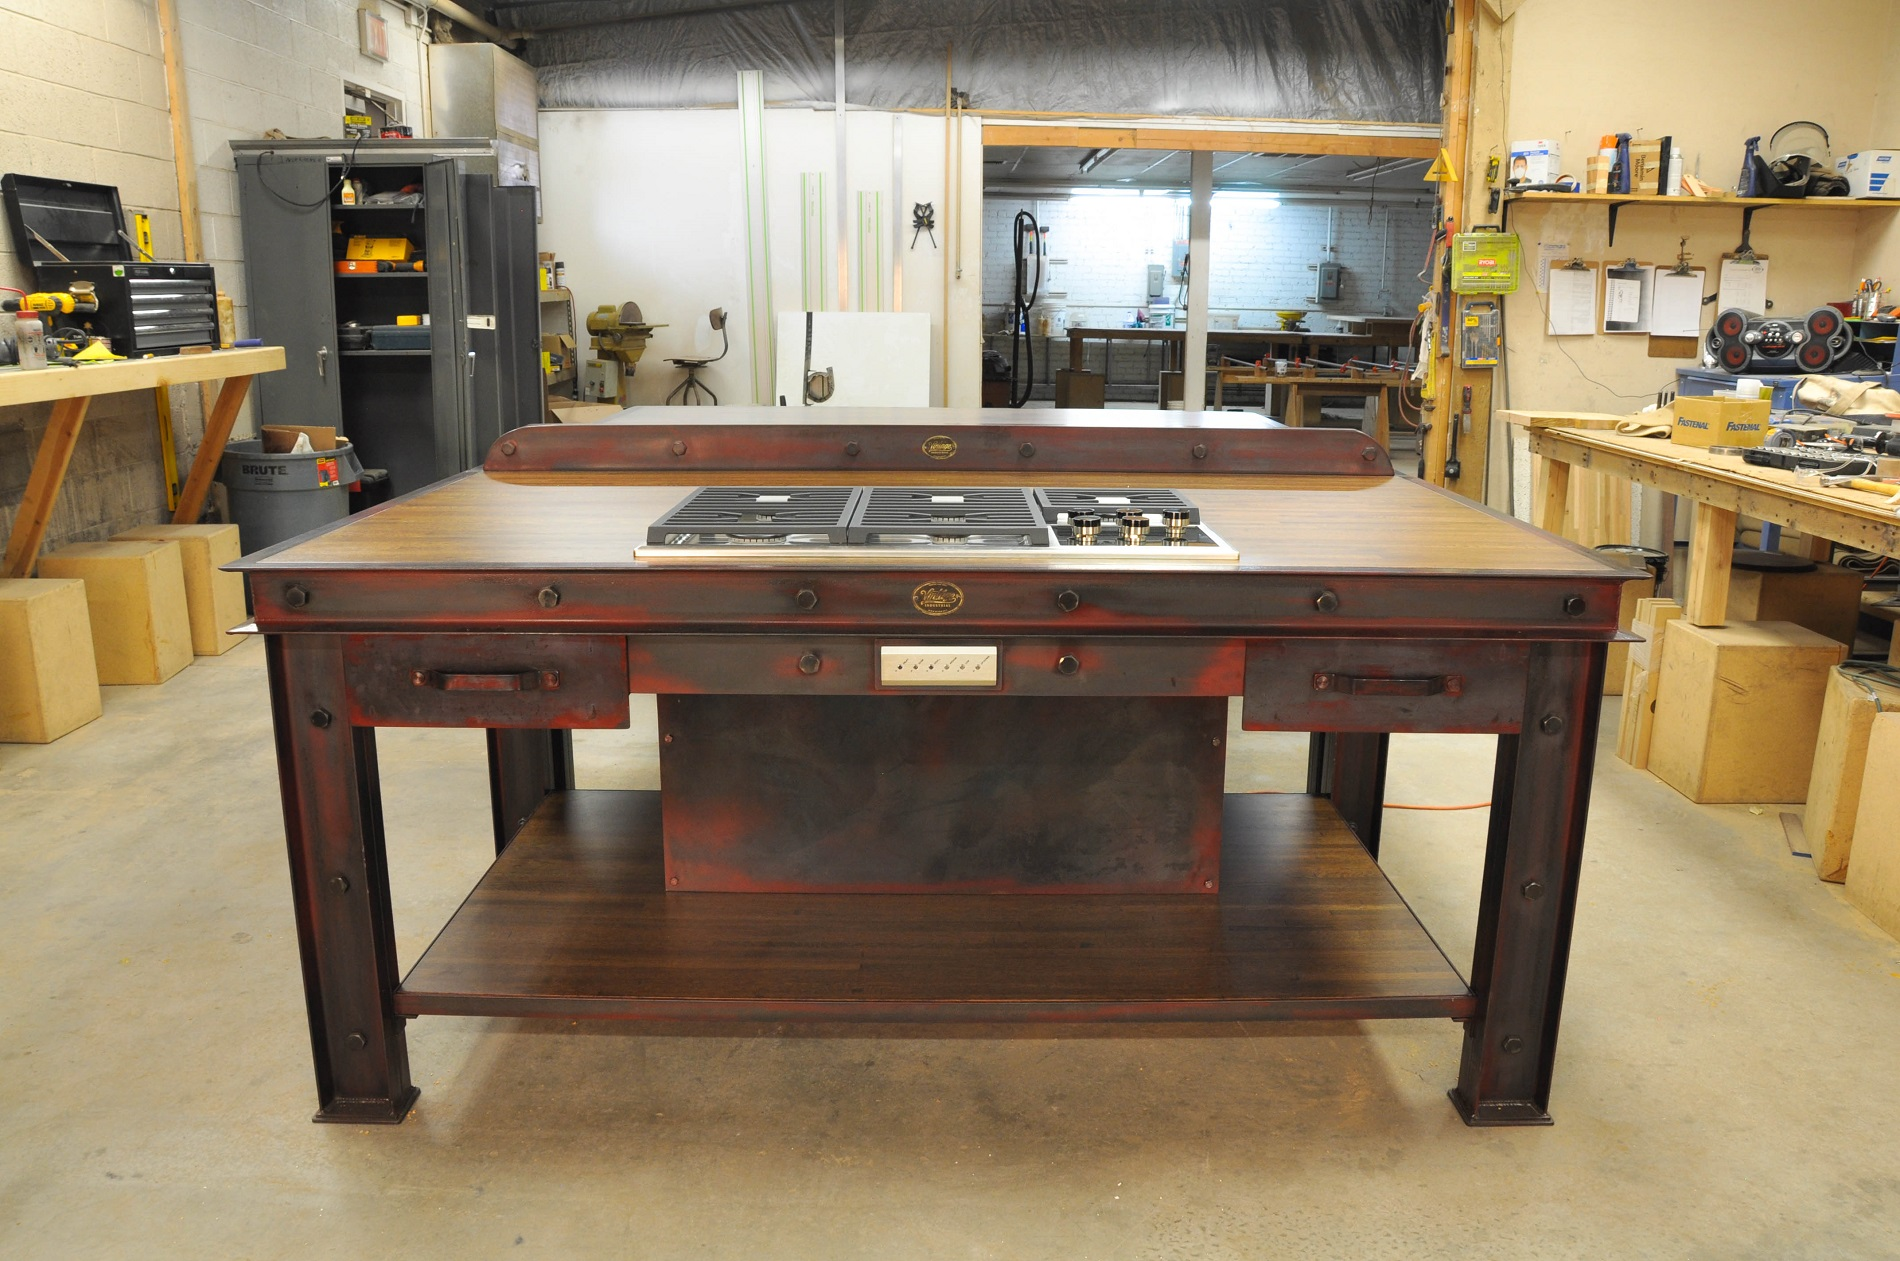 antique kitchen islands for sale outdoor kitchens tampa fl vintage industrial island | ...